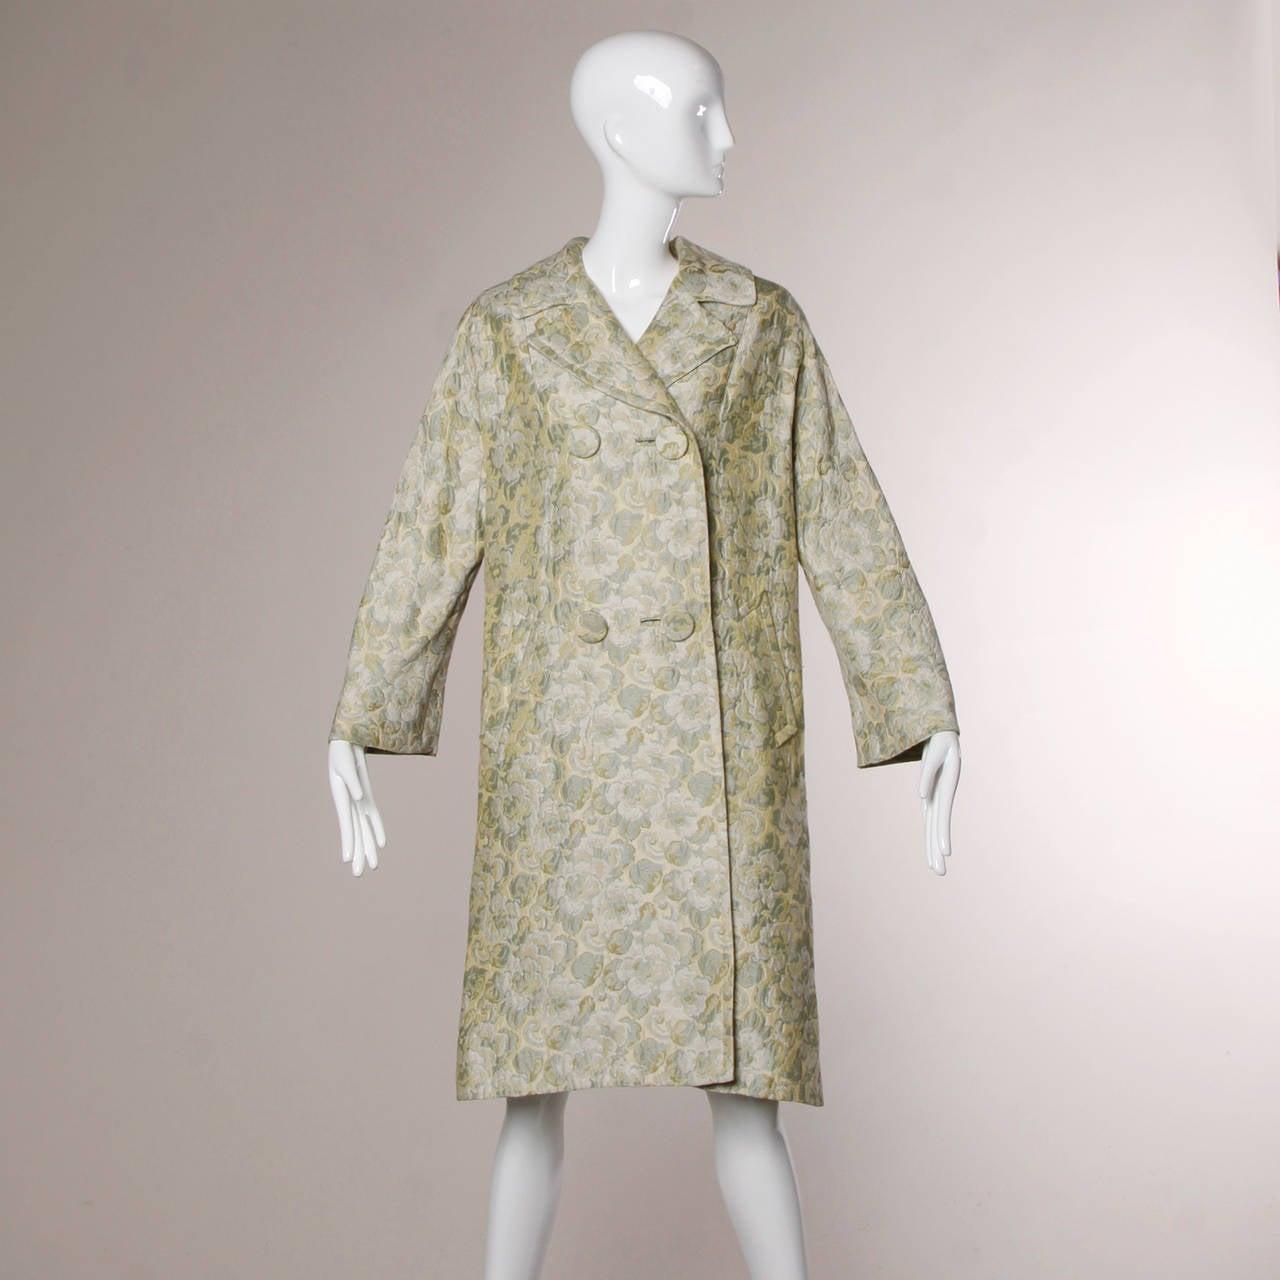 Joseph Magnin 1960s Vintage Metallic Brocade Tapestry Trench Coat 7